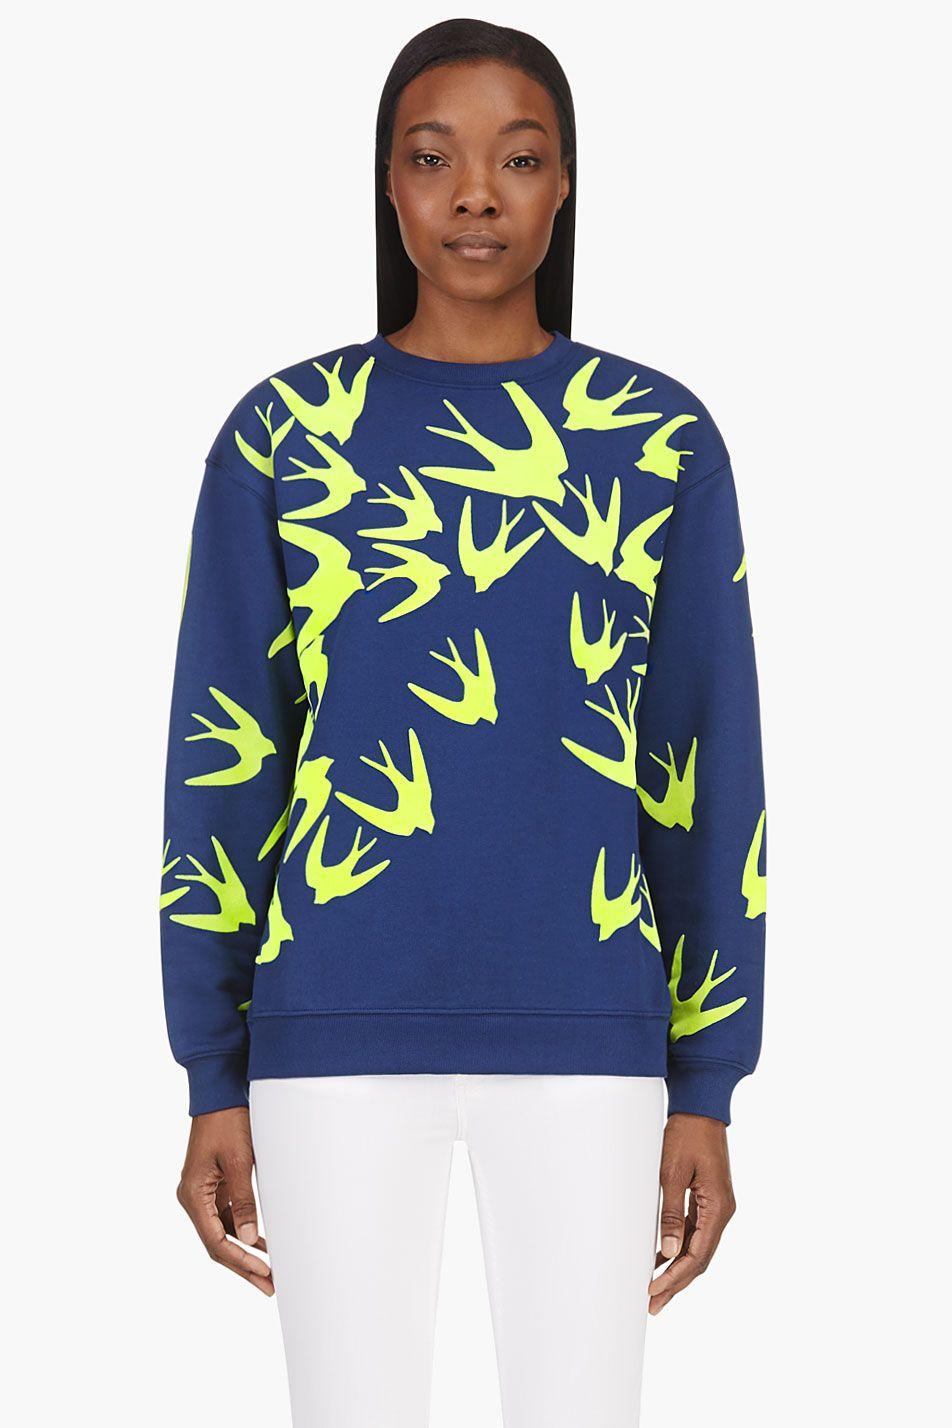 swallow  rondini  yellow  blue  fashion  cool  style  chic ... eba6c4951c0